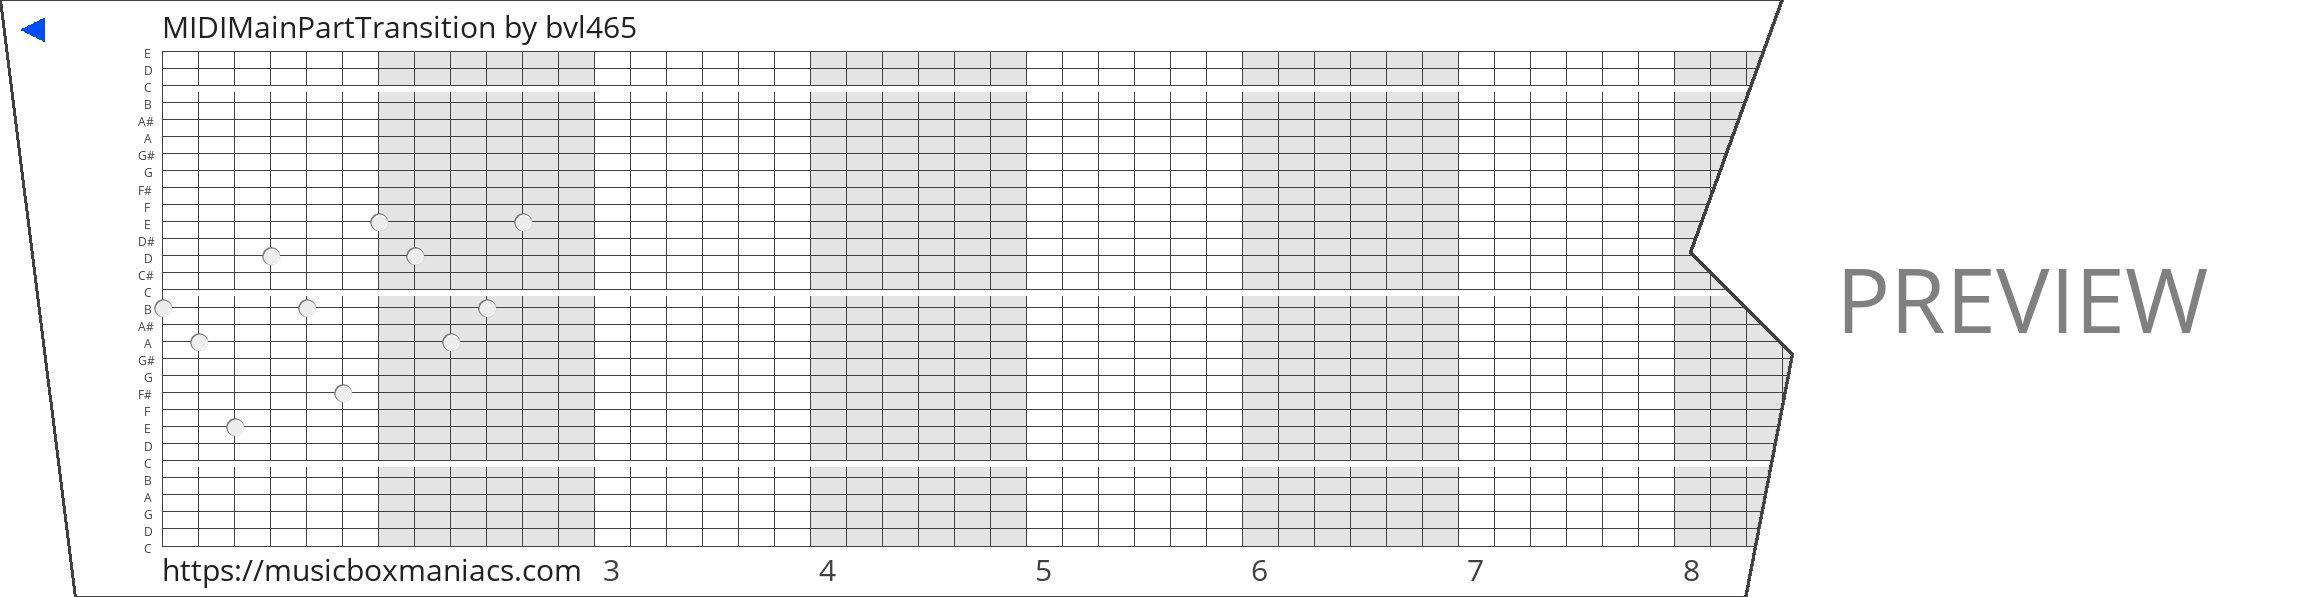 MIDIMainPartTransition 30 note music box paper strip